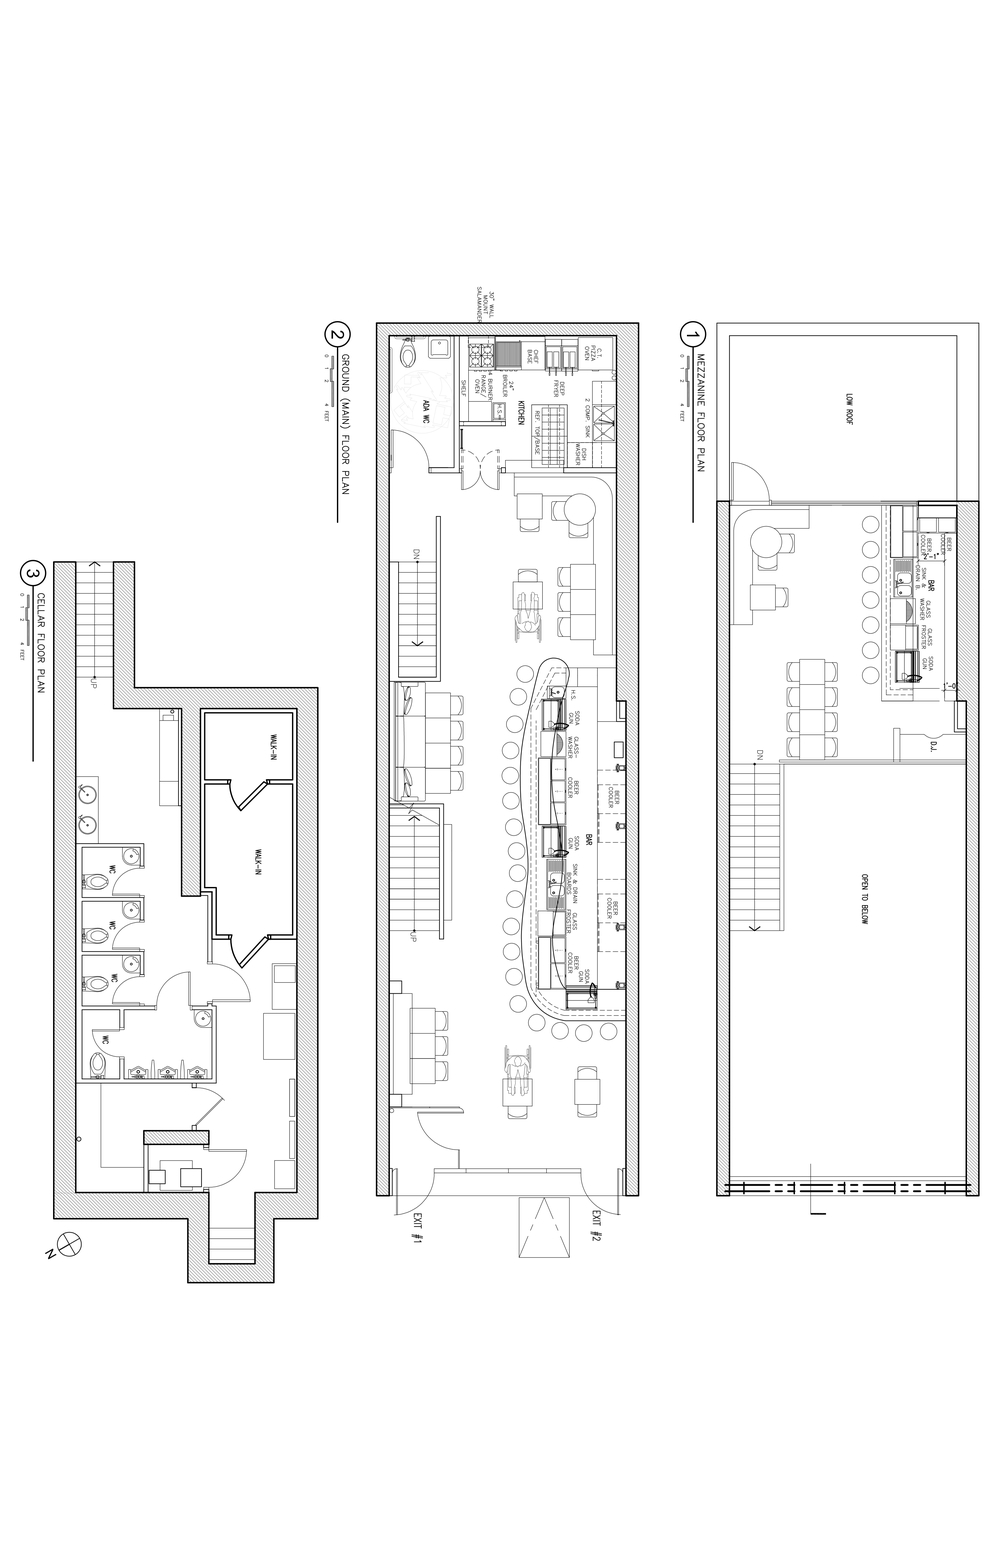 Abbey Rd Plans.jpg